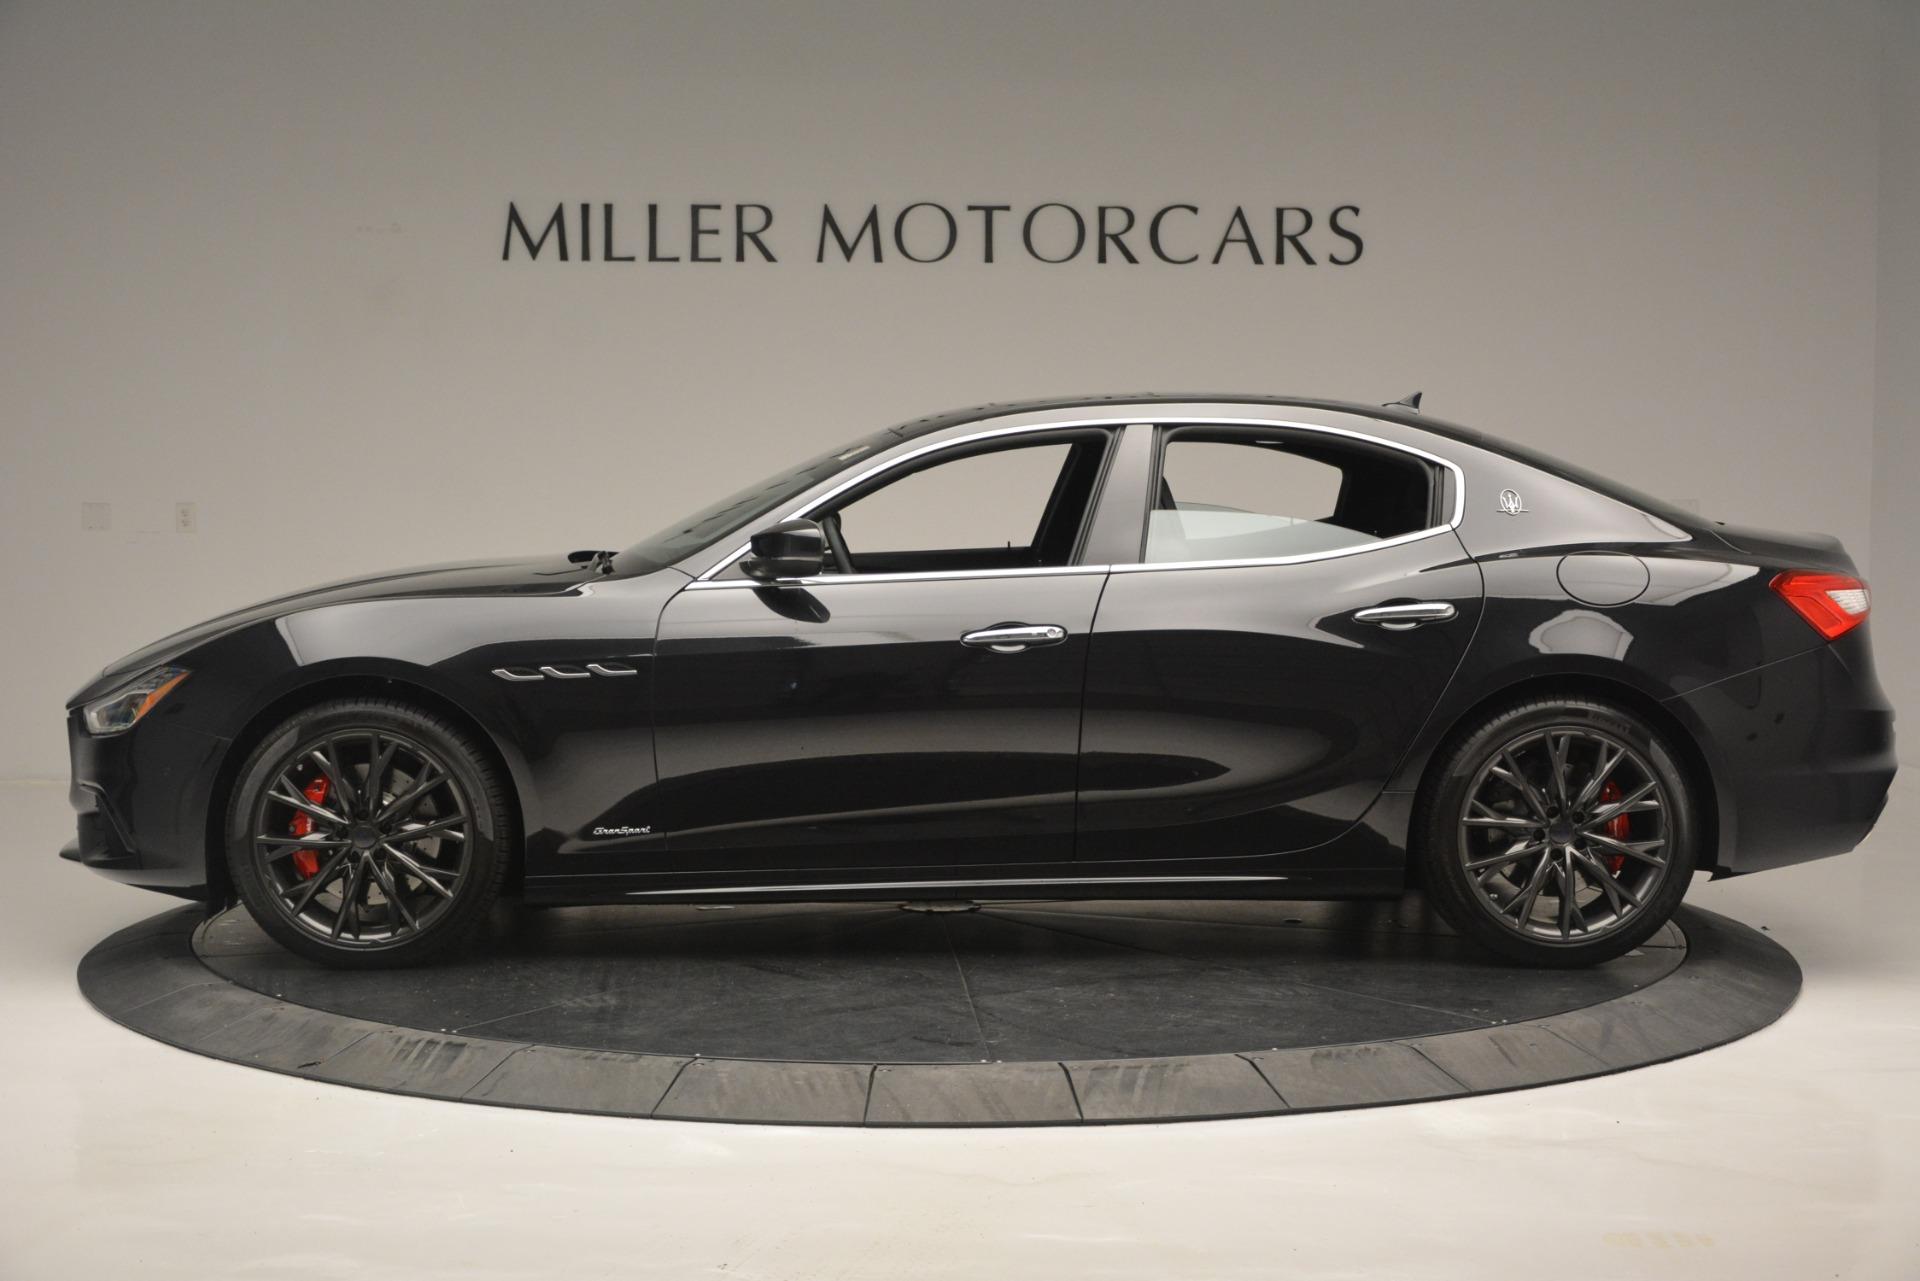 New 2019 Maserati Ghibli S Q4 GranSport For Sale In Westport, CT 2635_p3